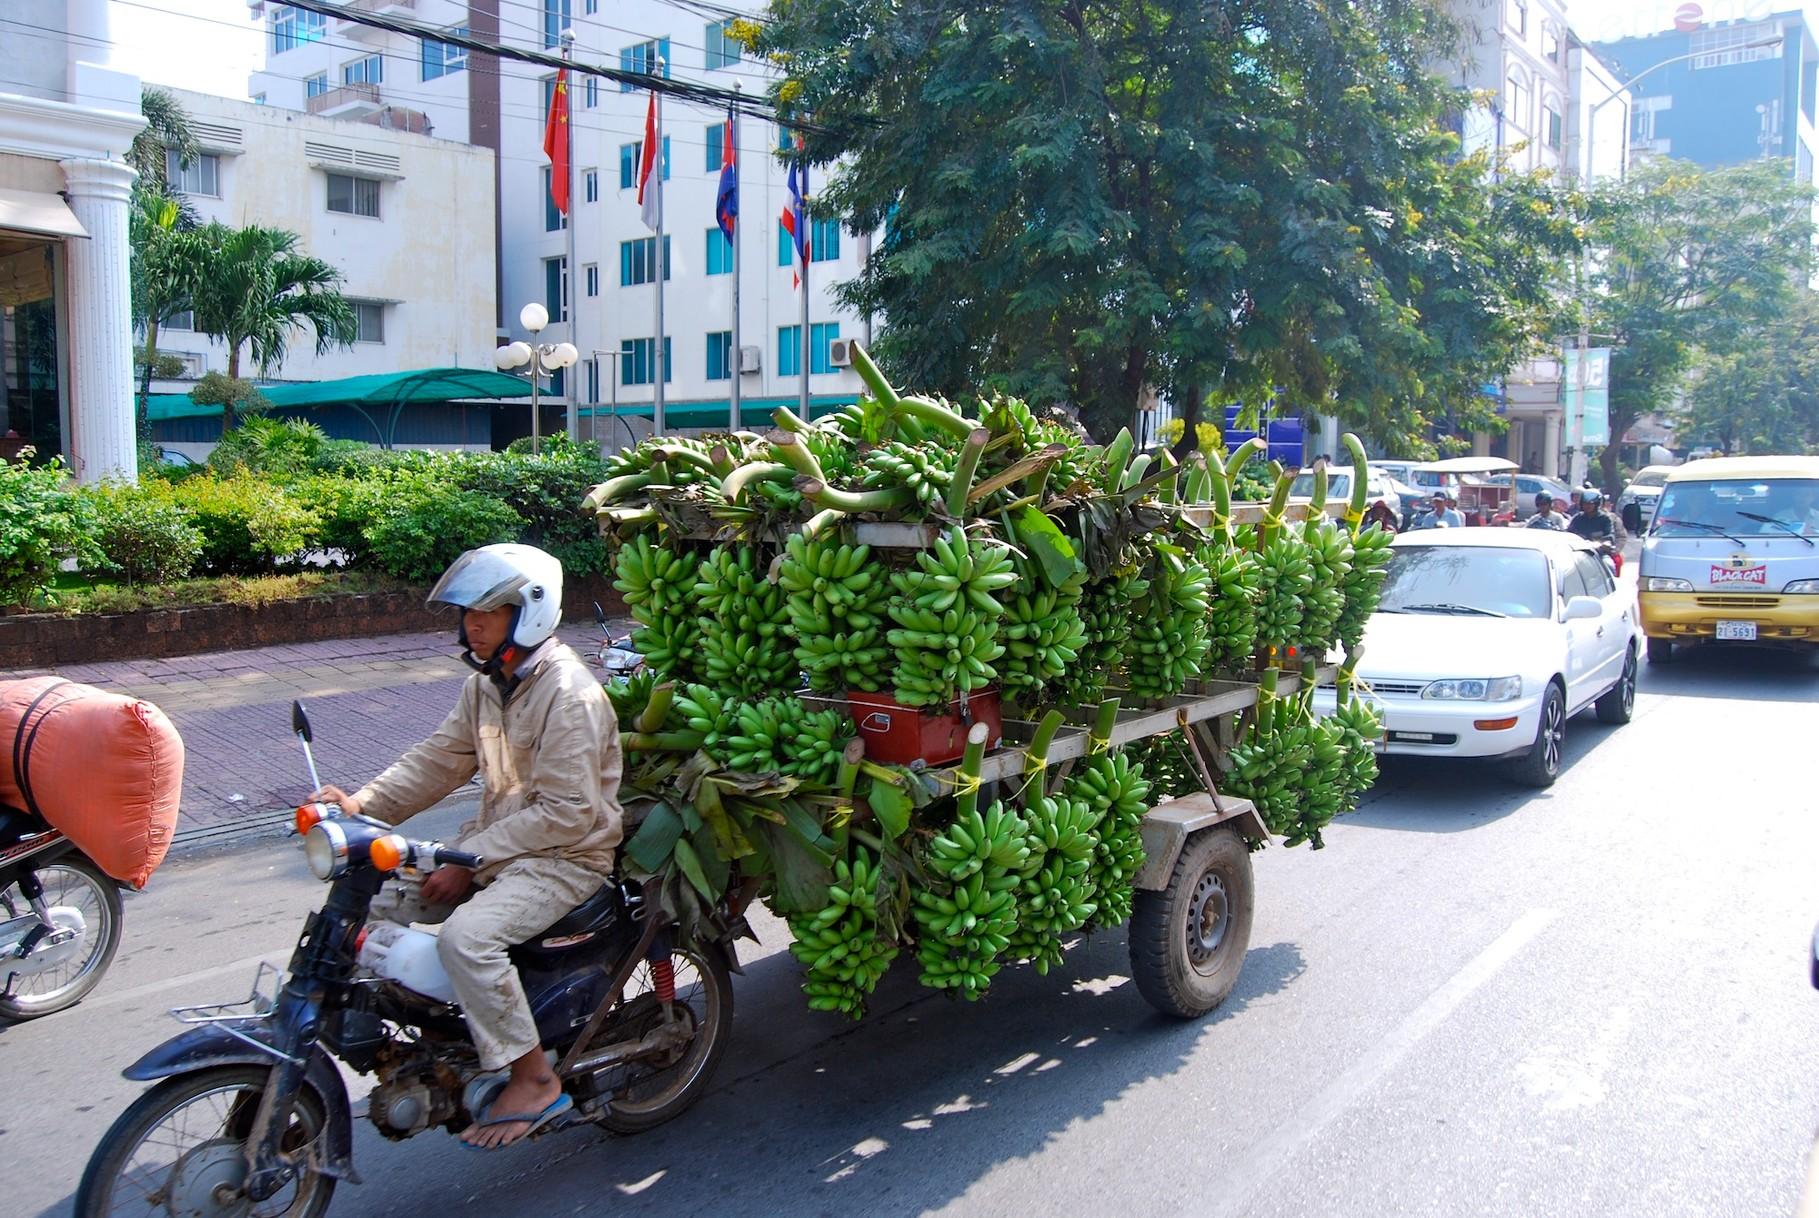 Wieviele Bananen kann man mit einem Moped liefern?